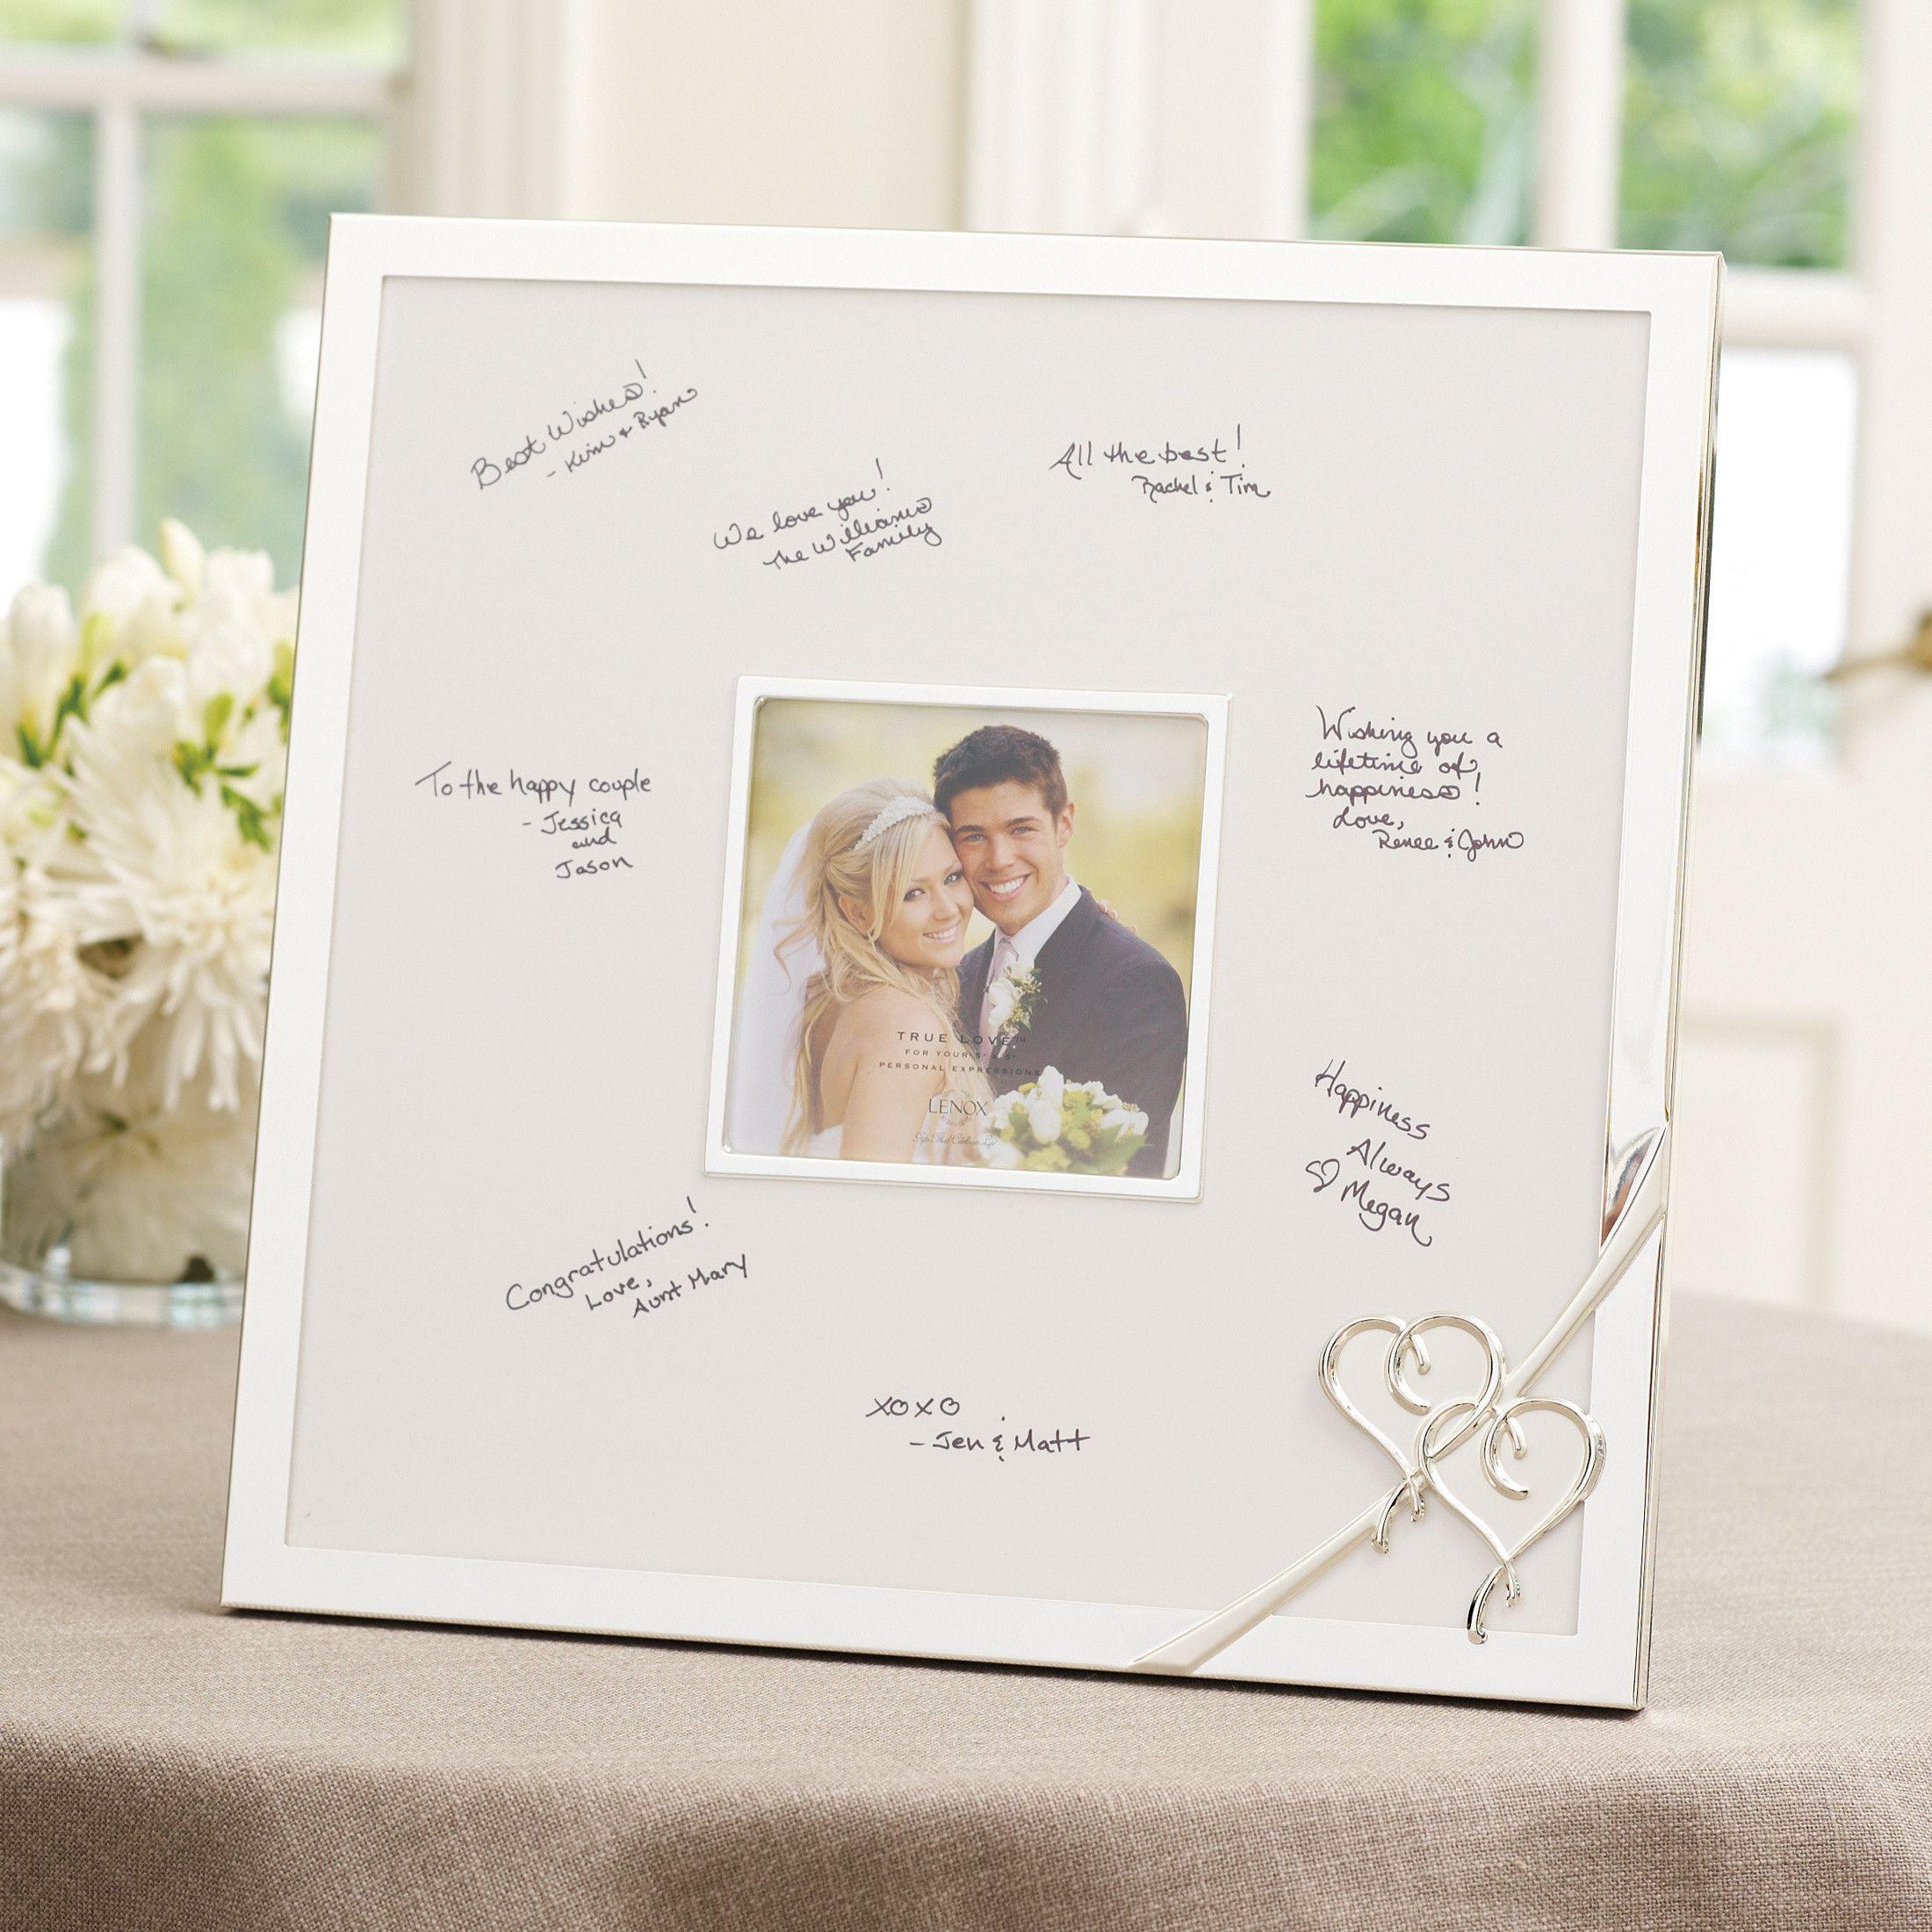 Lenox True Love Wedding Guest Book Frame | Wedding Guest Book Frame ...